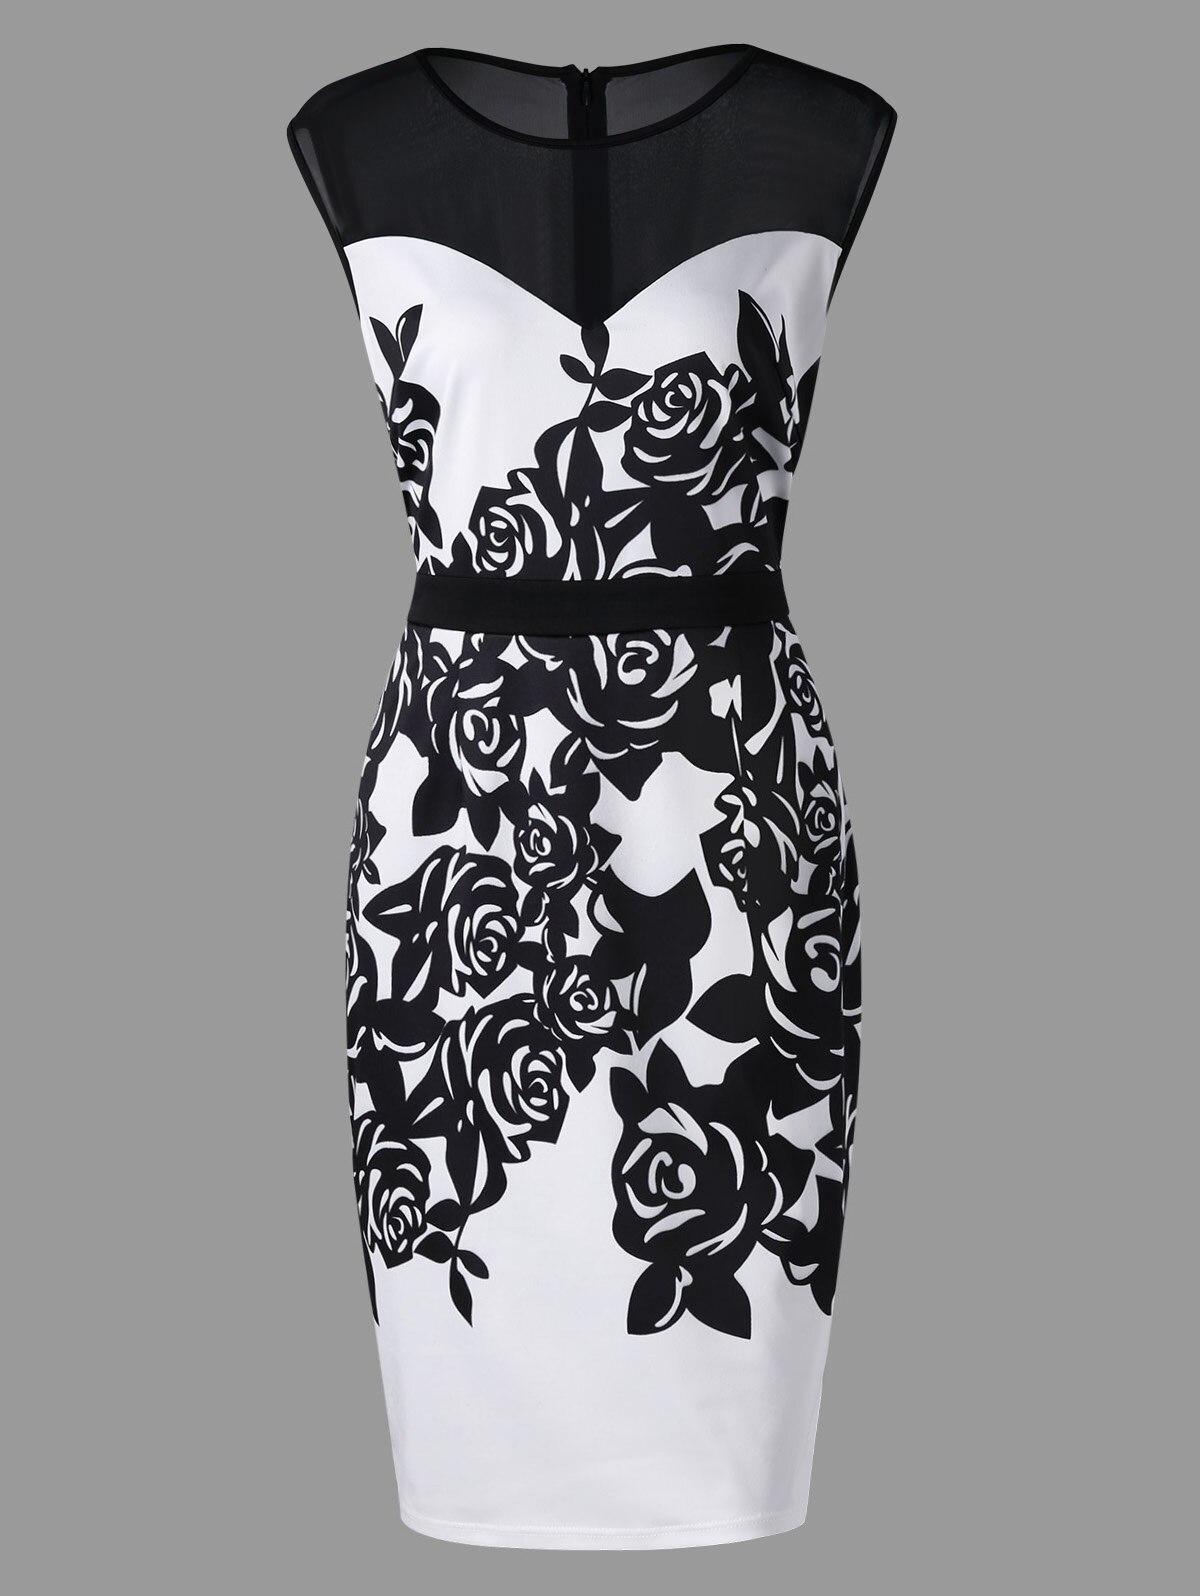 Vestidos Women Patchwork Floral Print Elegant Business Party Formal Office Plus Size Bodycon Pencil Casual Work Dress